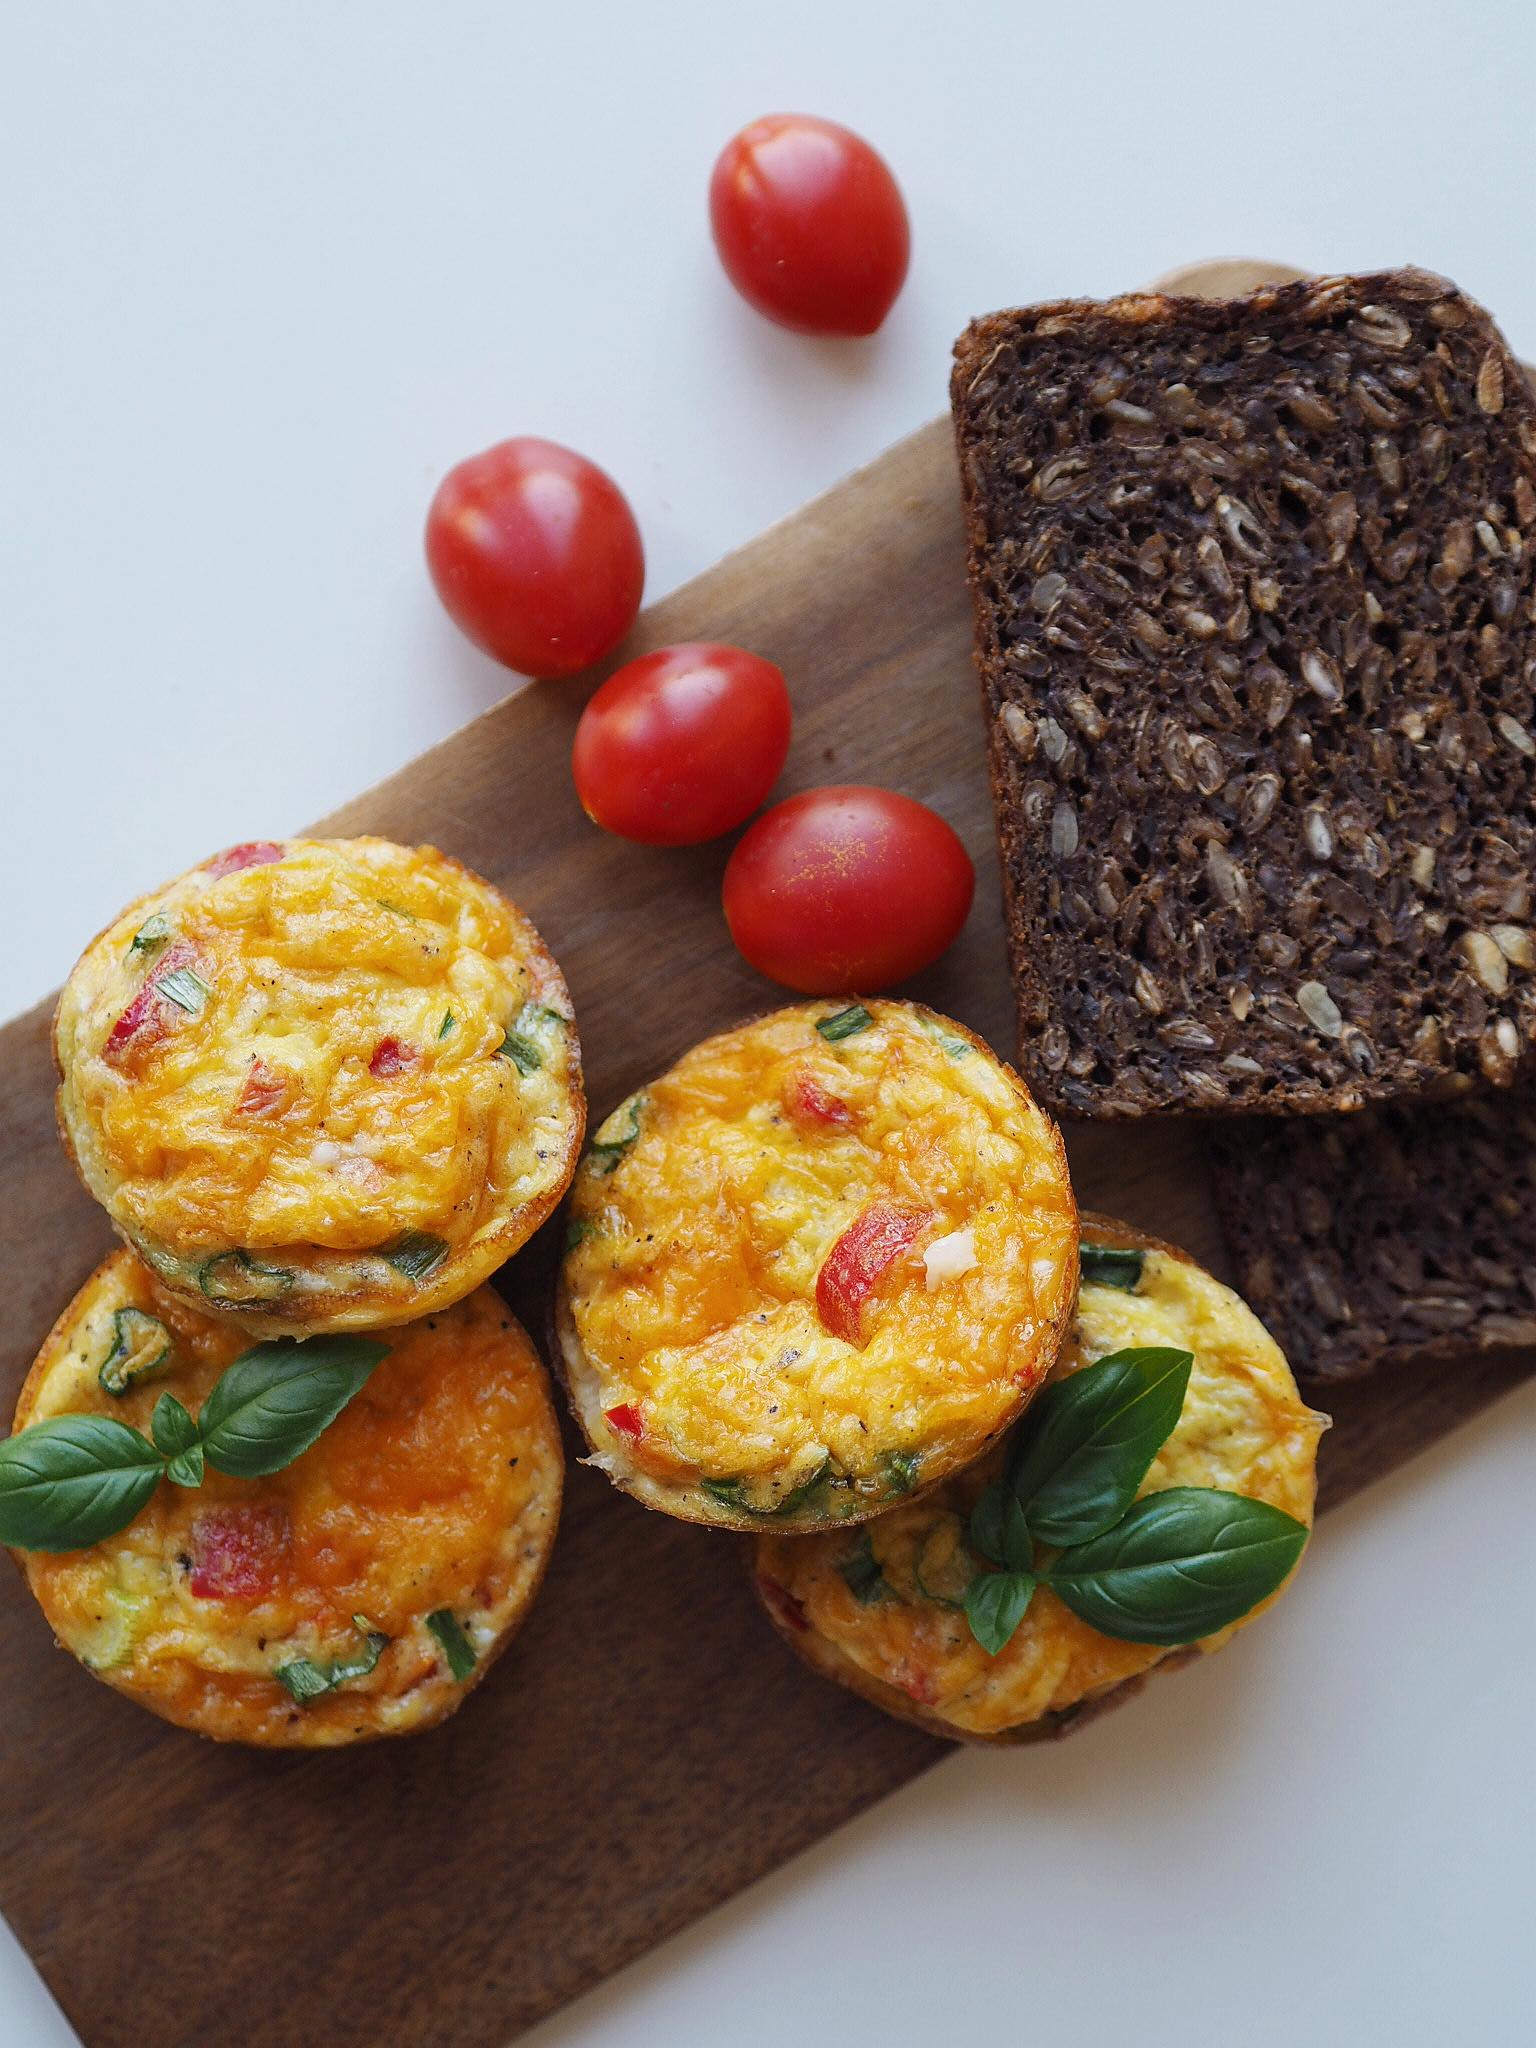 Lette små æggekager med grønt og ost